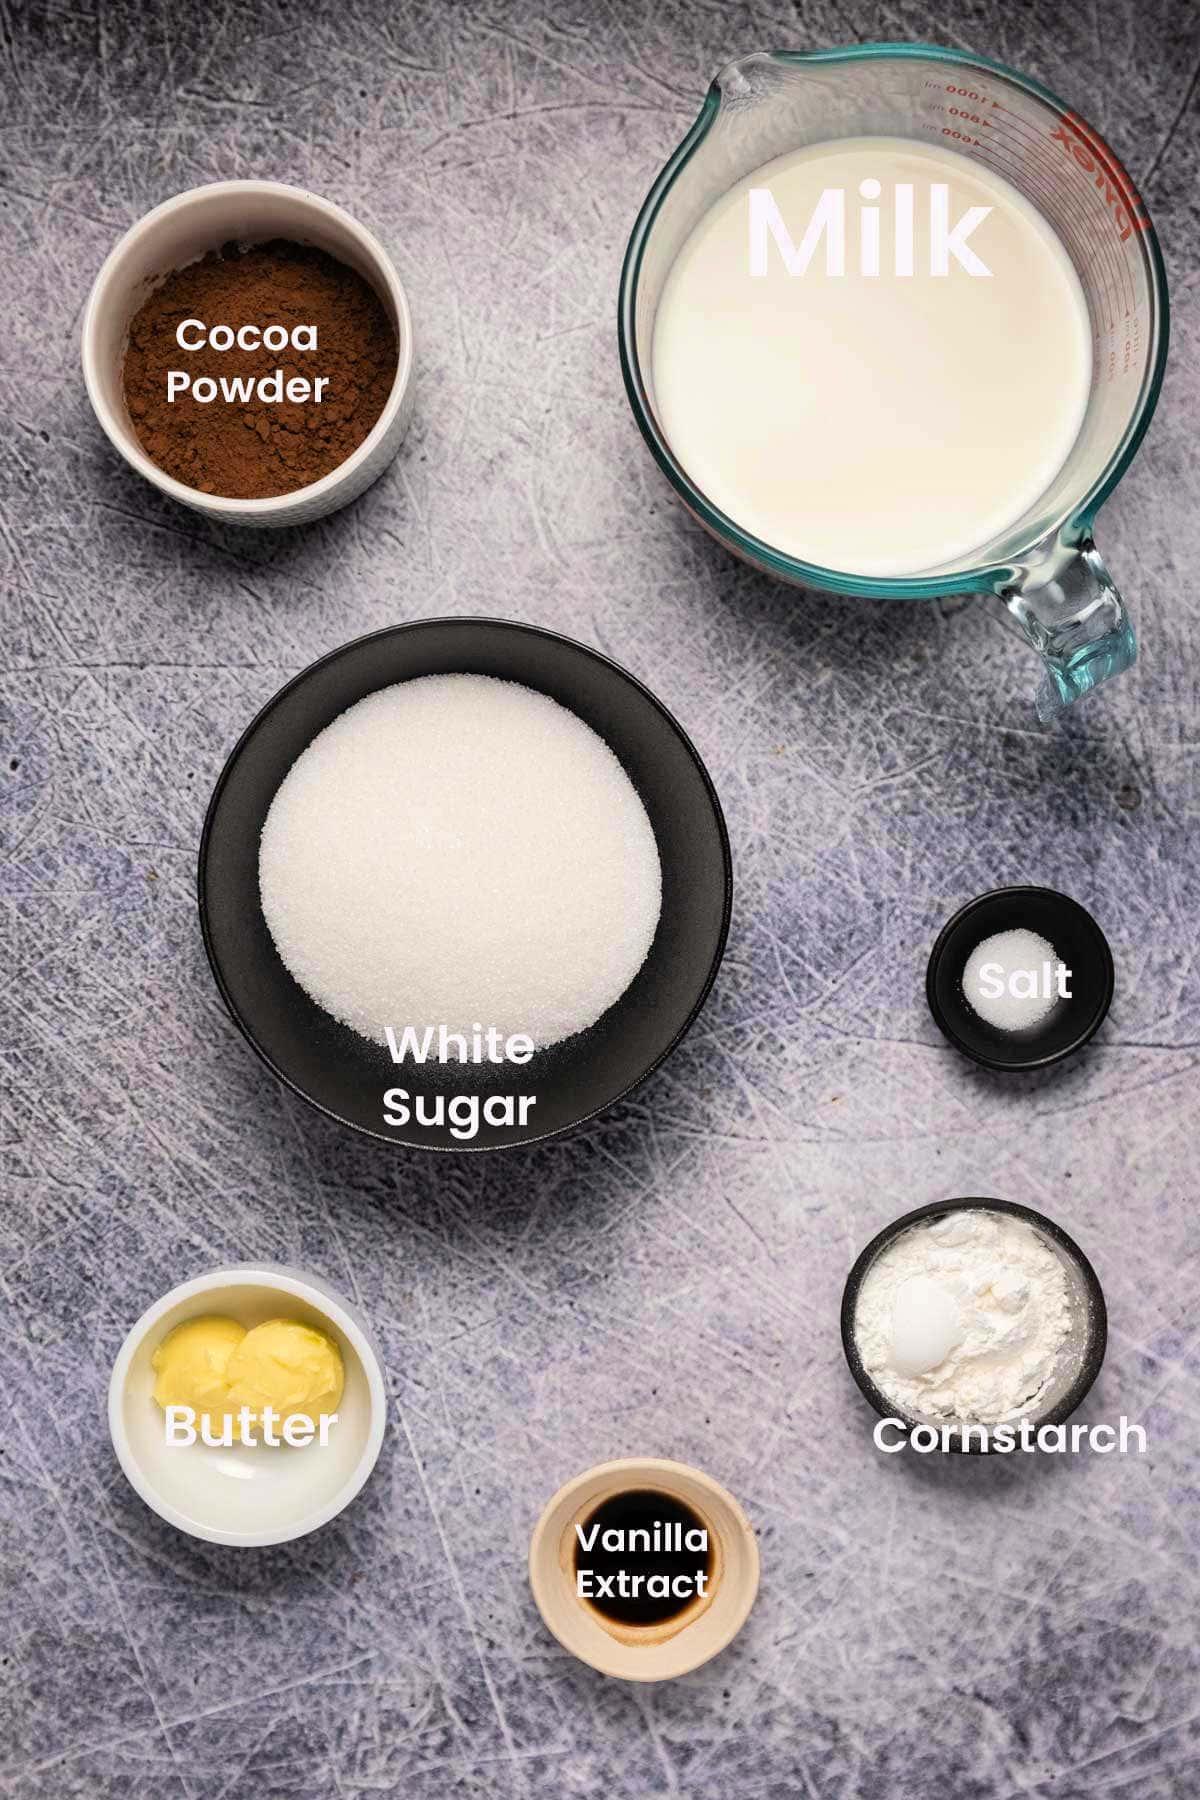 Ingredients to make chocolate pudding.